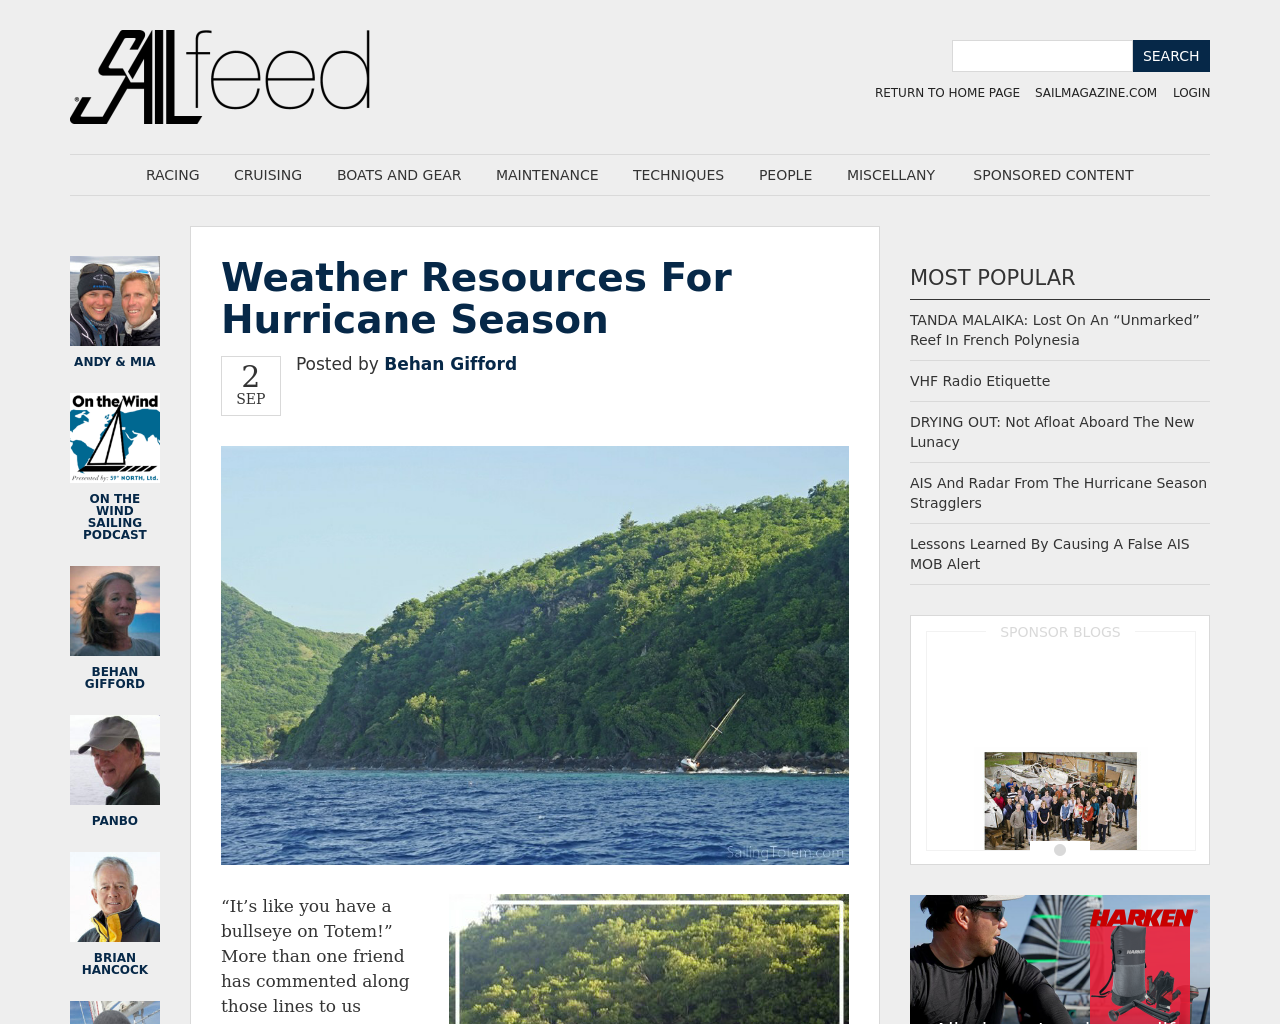 Sailfeed-Advertising-Reviews-Pricing